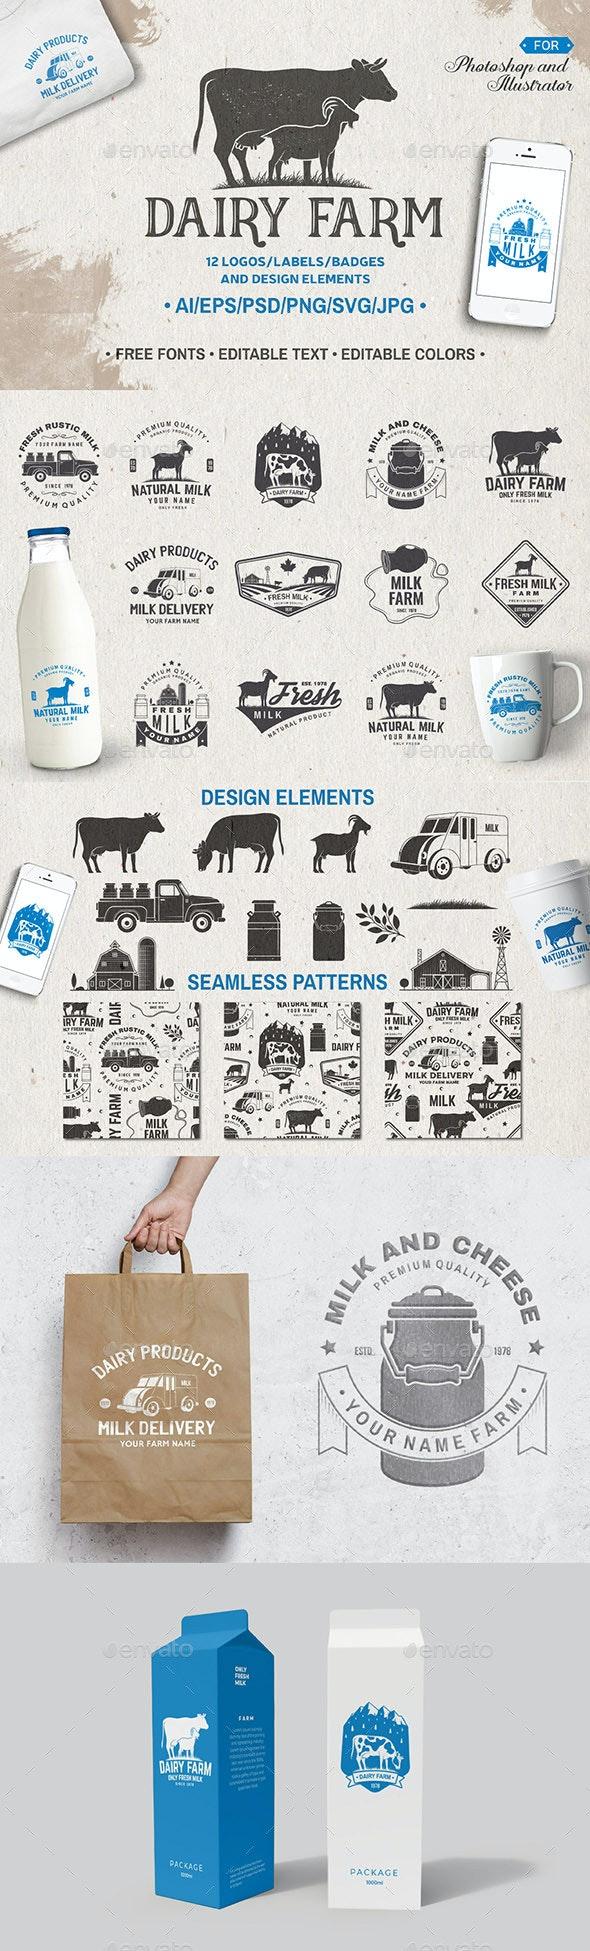 Dairy Farm - Badges & Stickers Web Elements